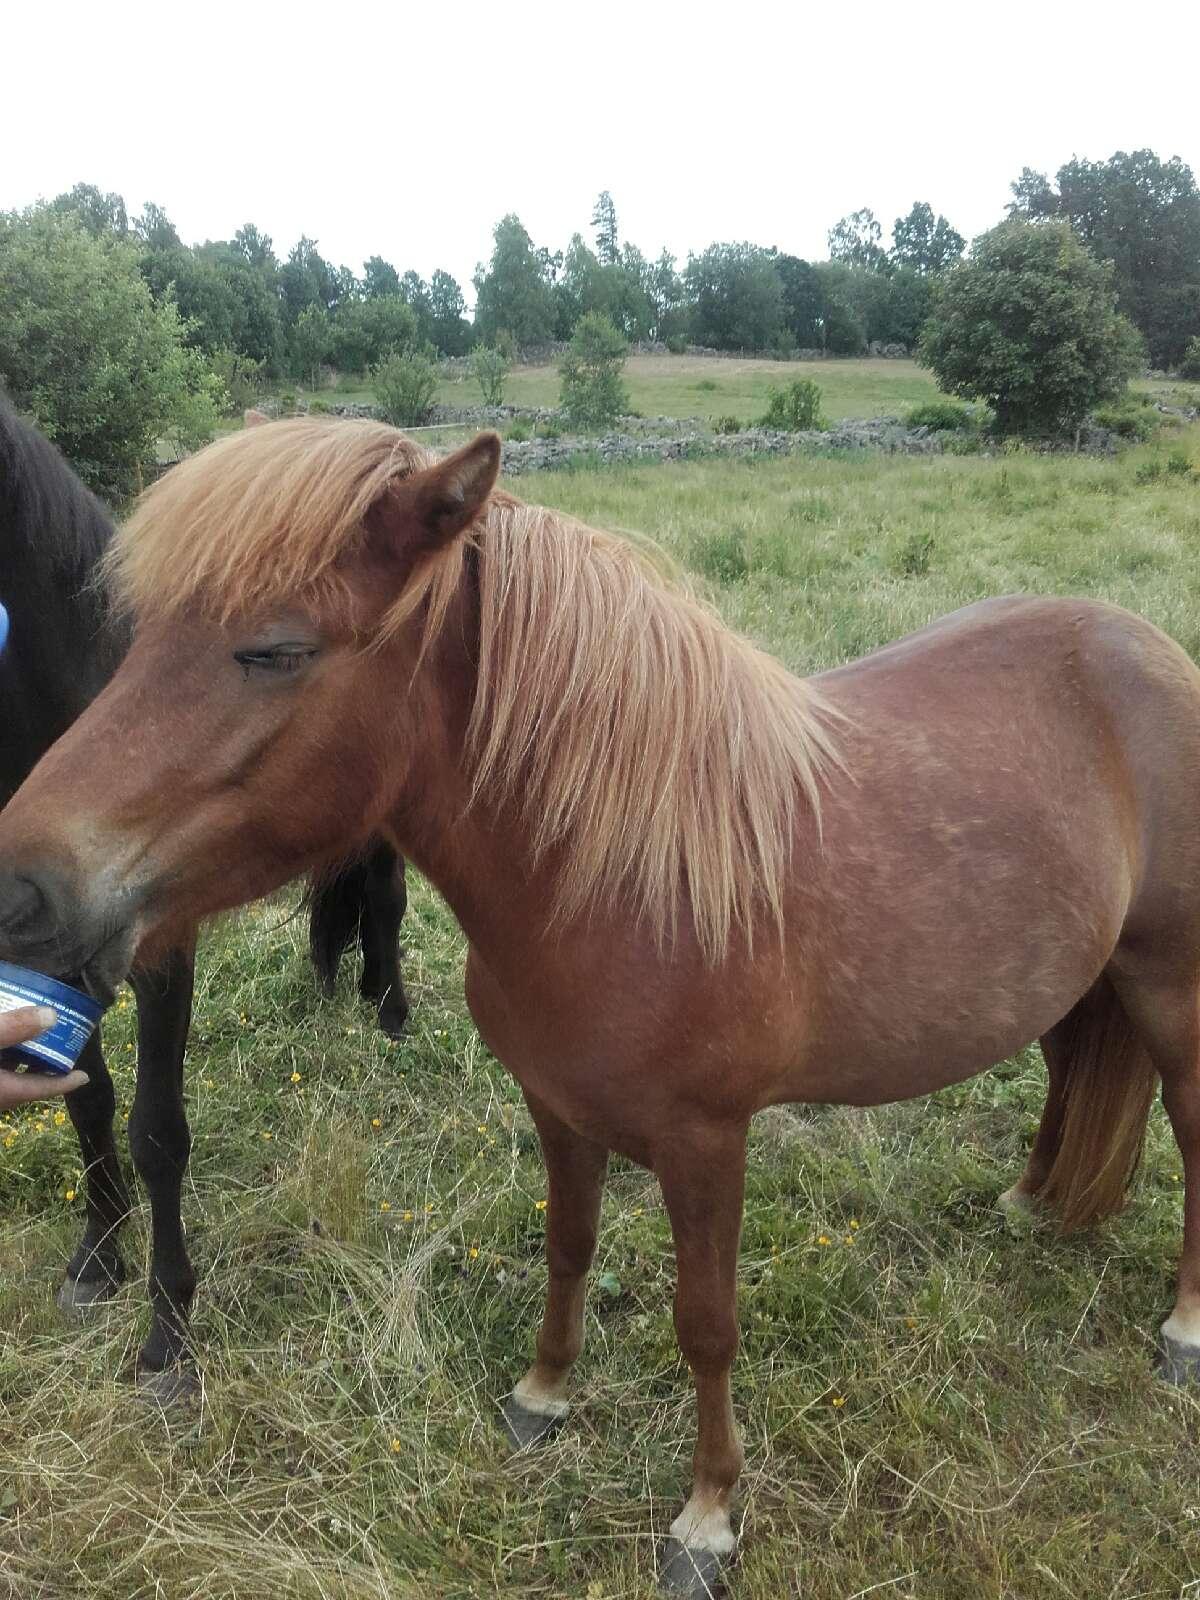 winken Unsere Pferde-sparrarpislandshastar.com | 2020